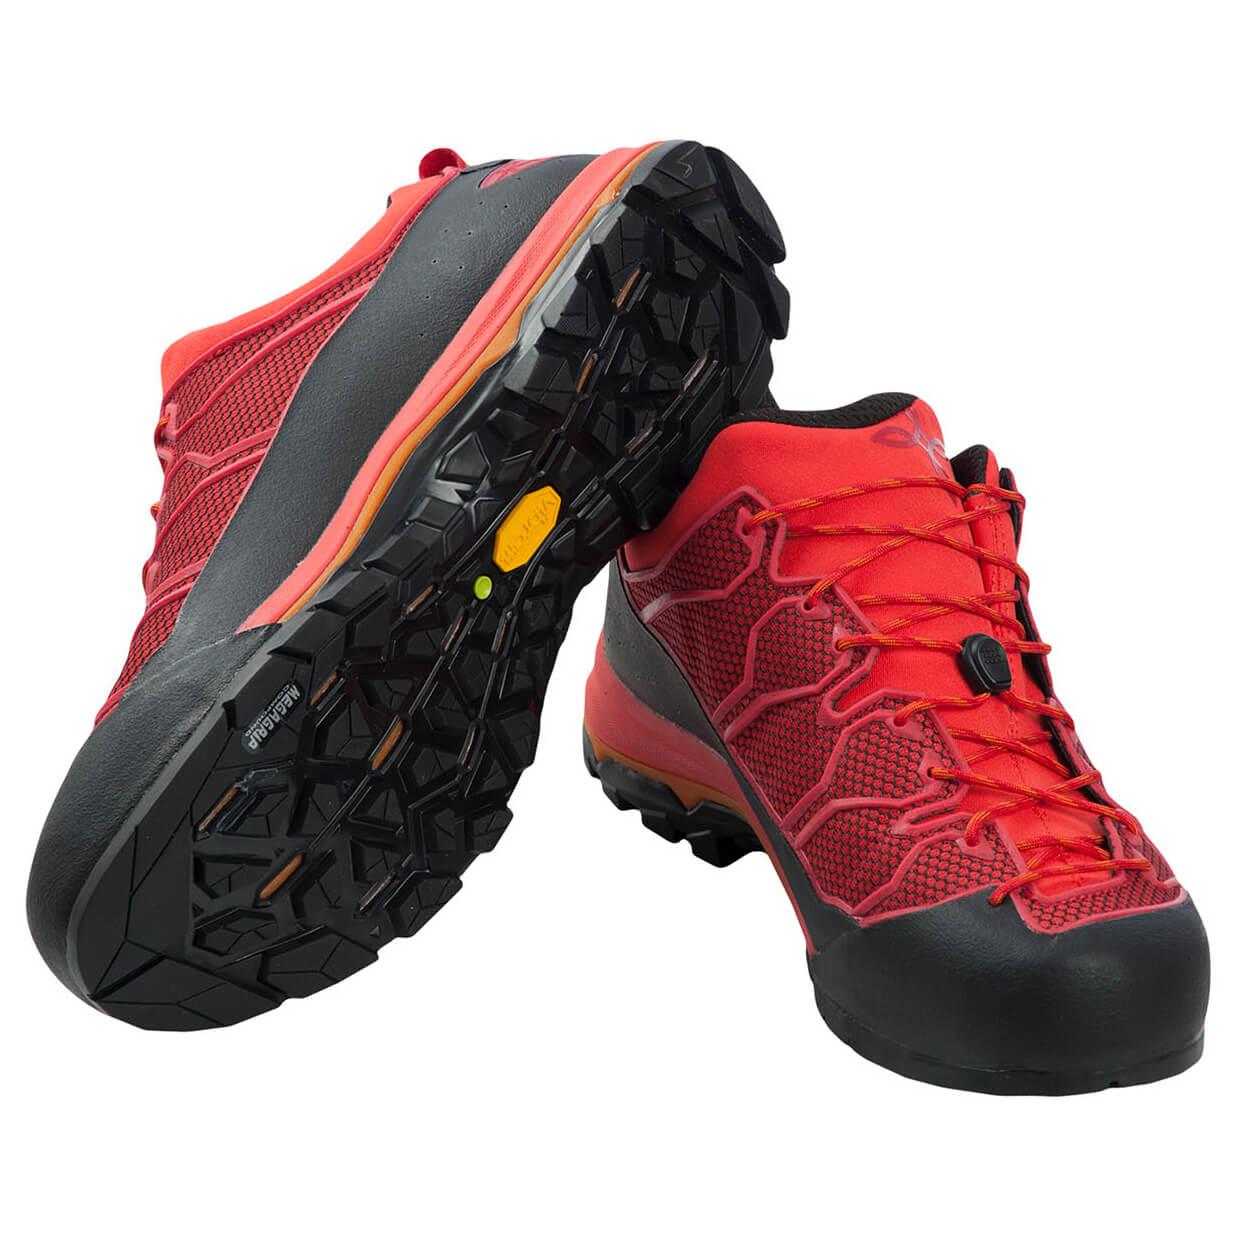 Montura - Lumière Yaru - Chaussures Approche Taille 9,5 Noir